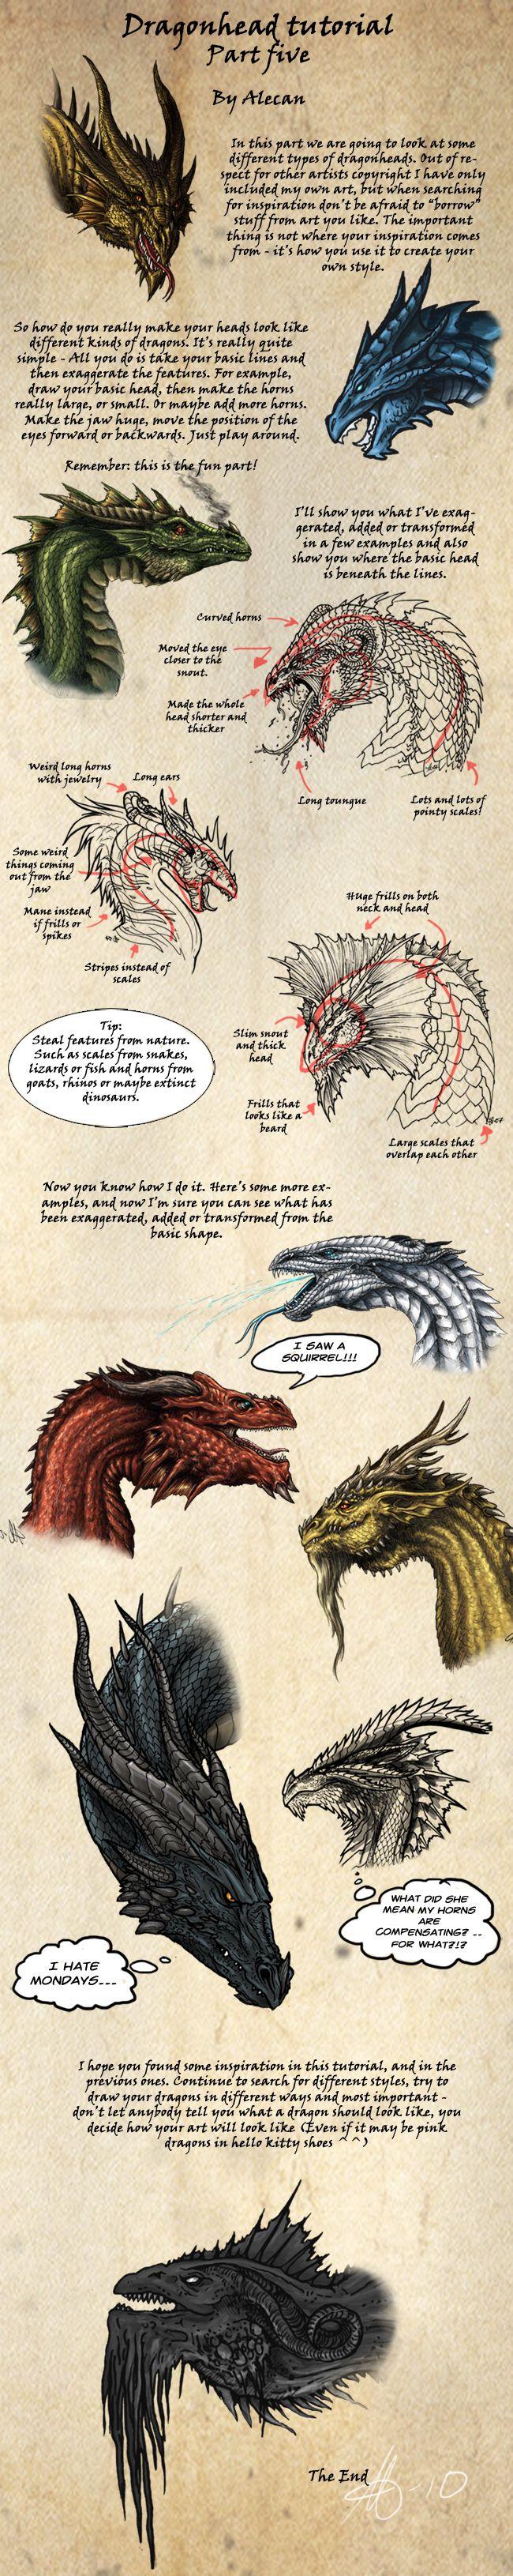 Dragonhead Tutorial Part Five by Alecan on Deviantart